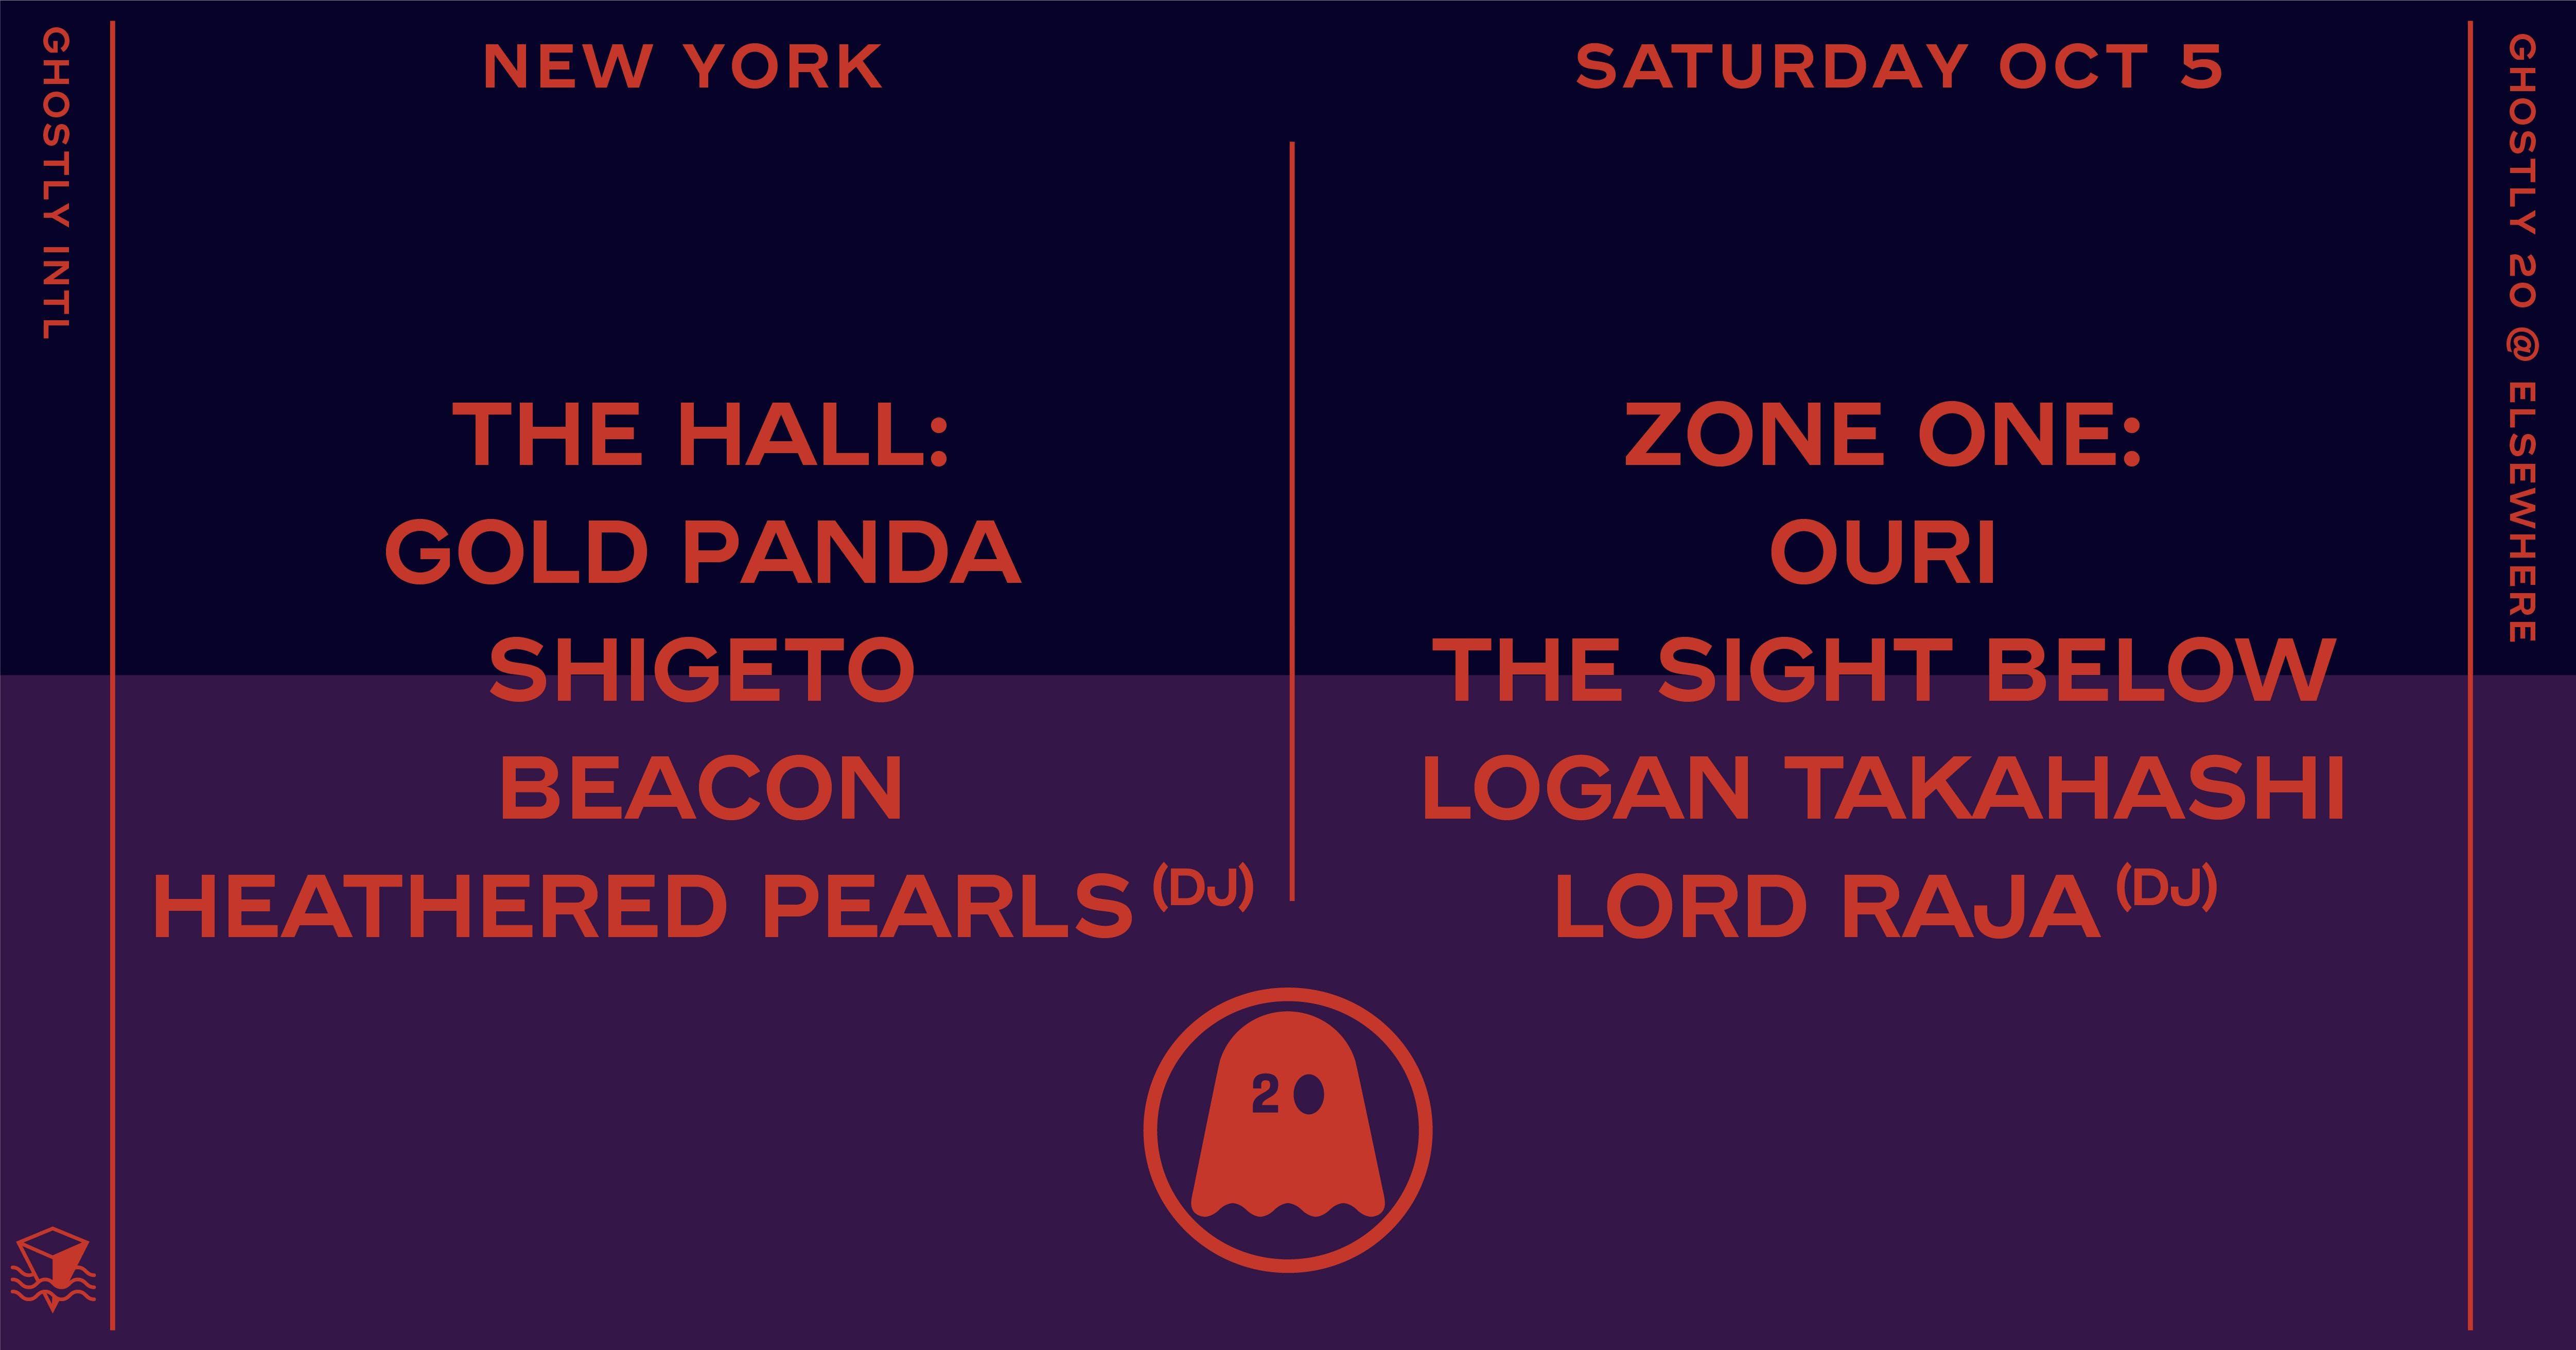 Ghostly 20 (Early) w/ Gold Panda, Shigeto, Beacon, Heathered Pearls (DJ),  Ouri, The Sight Below, Logan Takahashi, Lord RAJA (DJ), Starchild & The New Romantic (DJ)